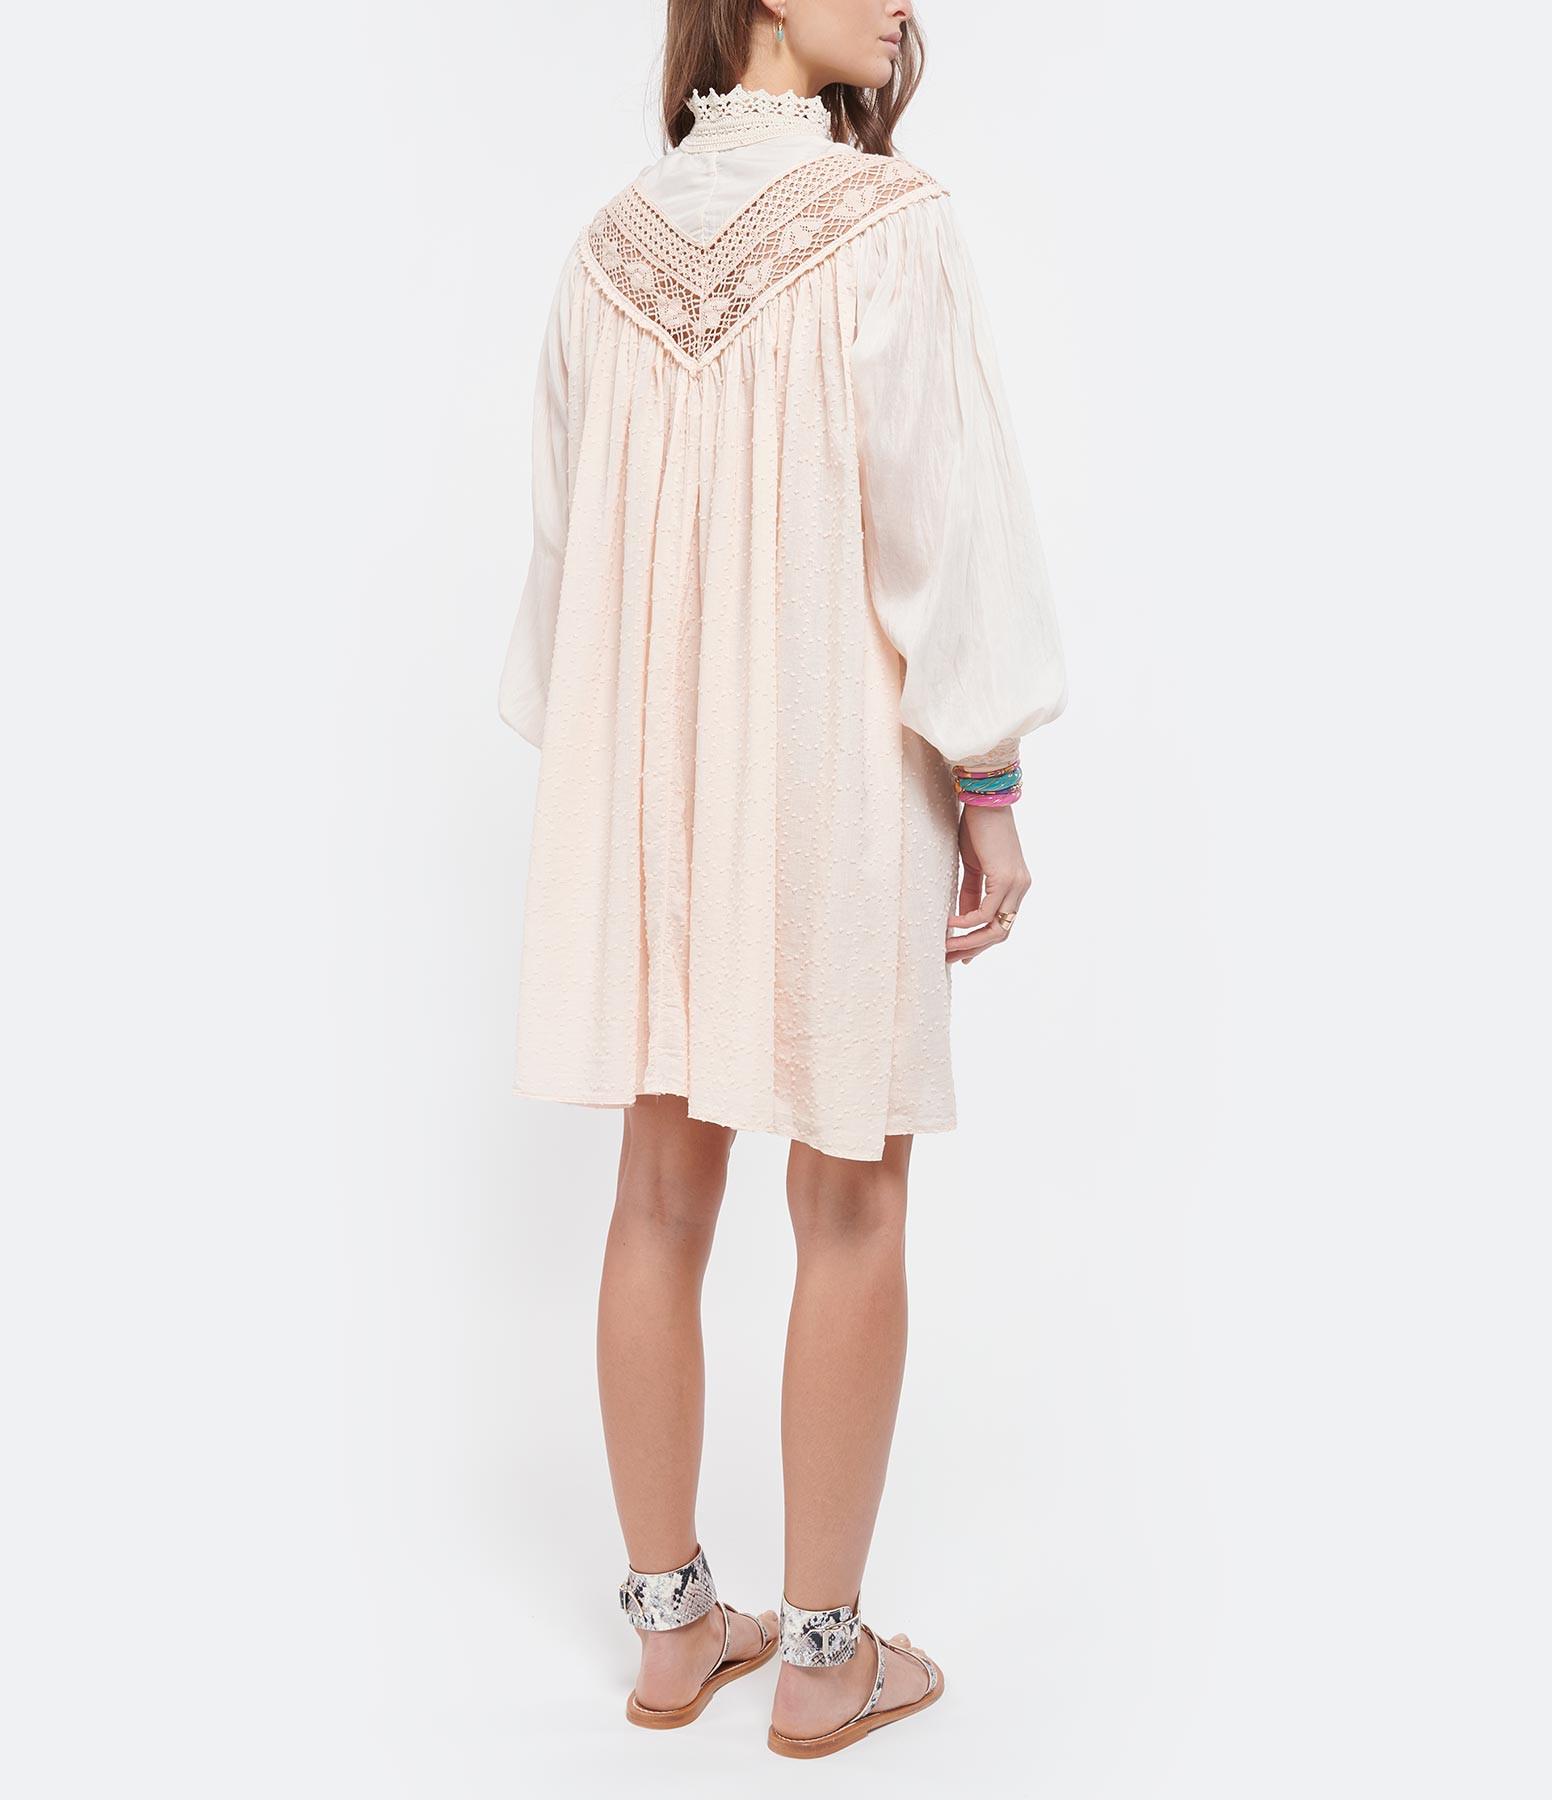 FORTE_FORTE - Robe Coton Plumetis Ivoire